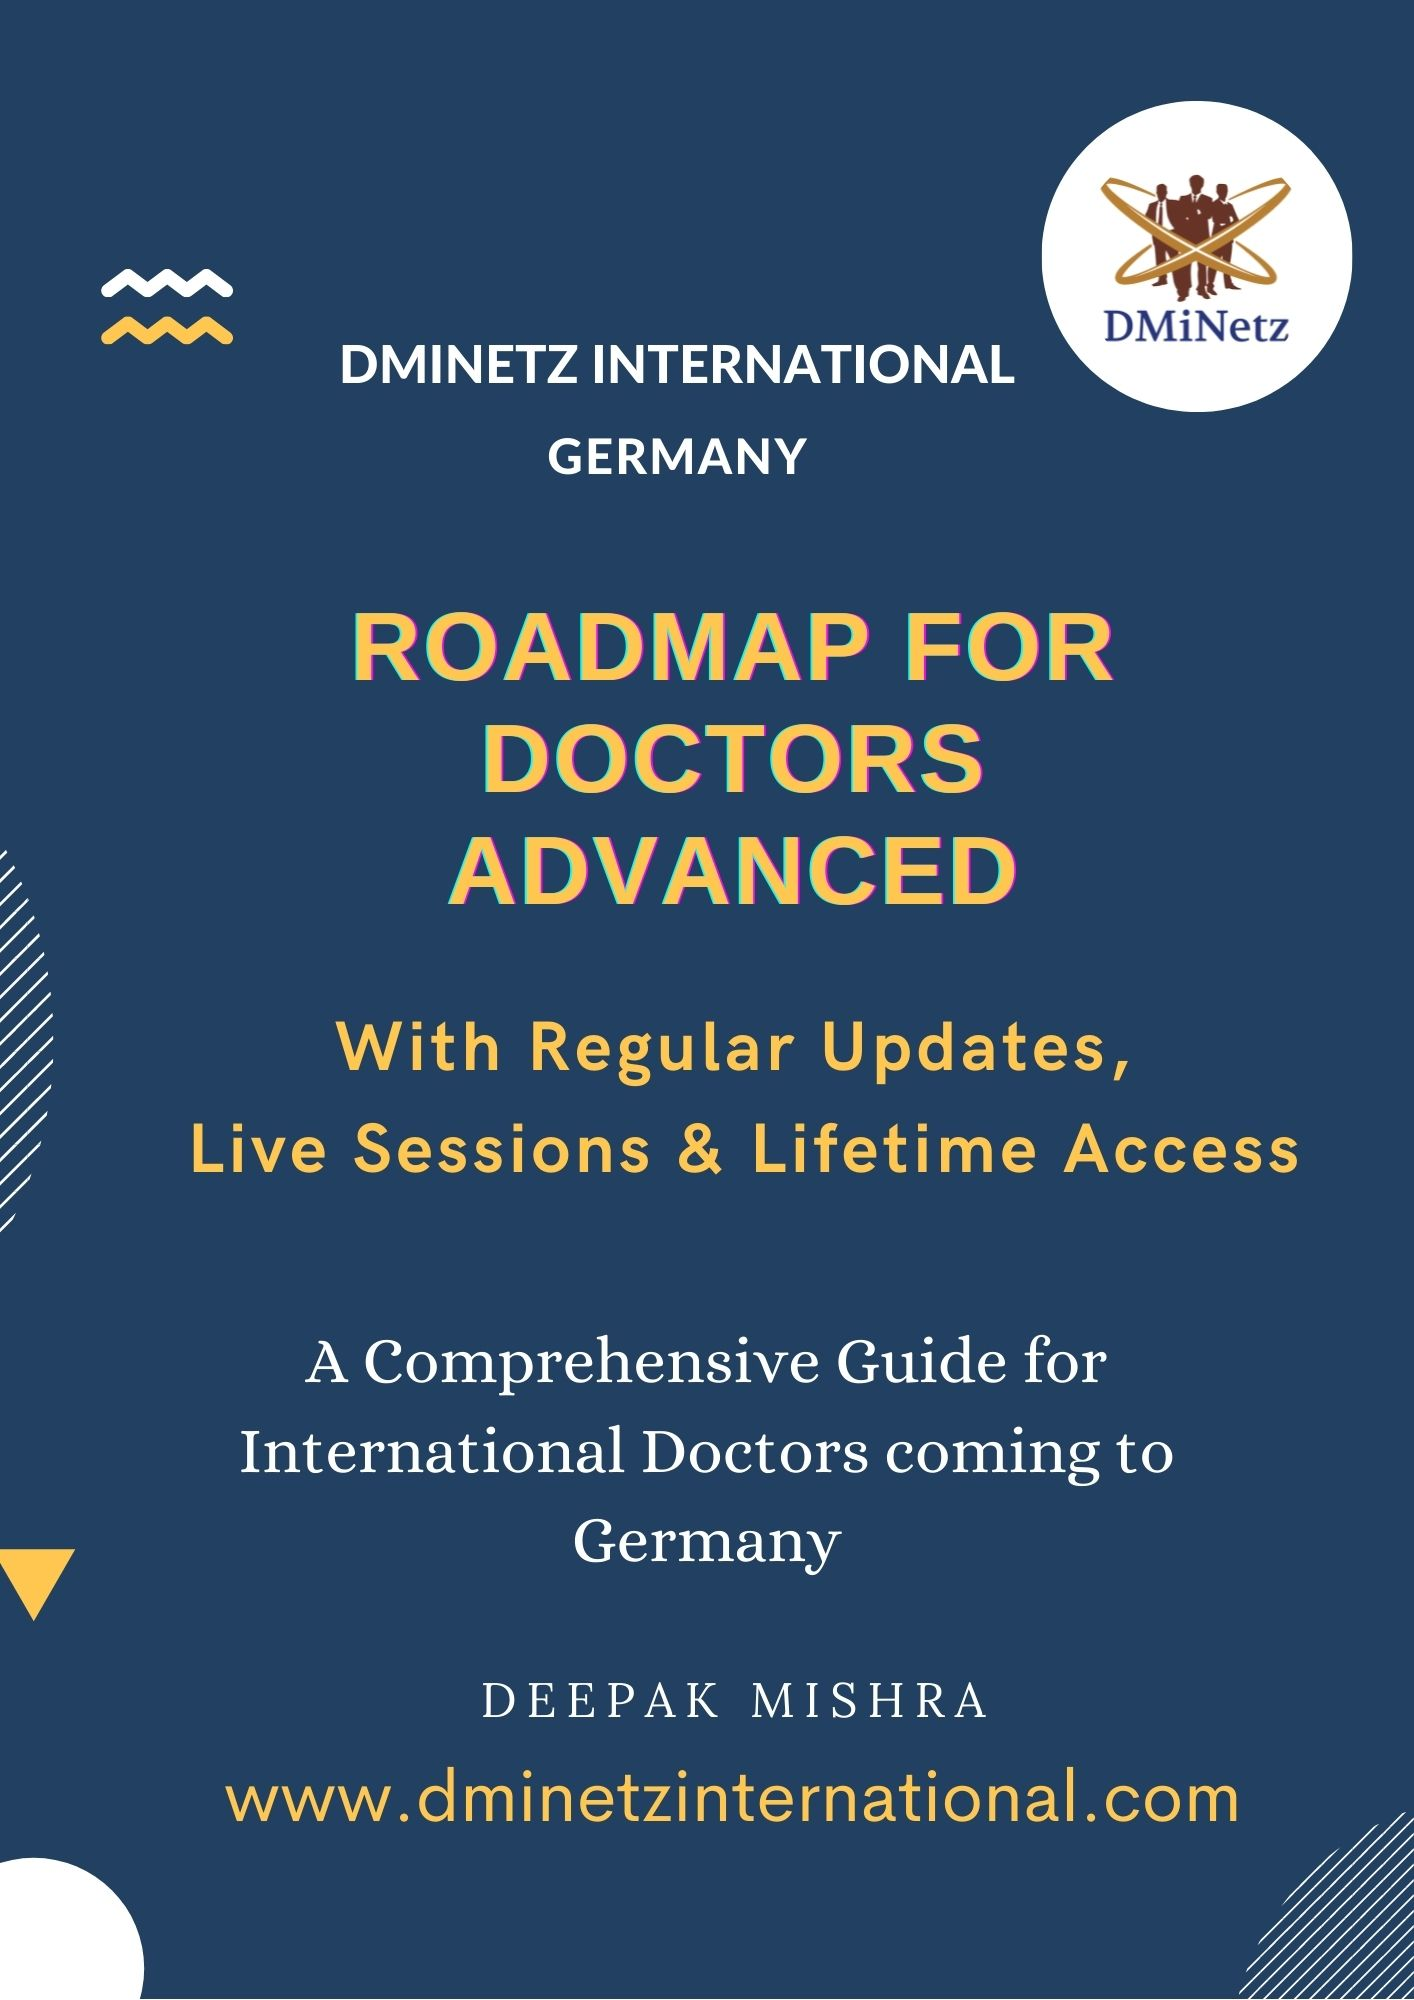 roadmap for doctors advanced